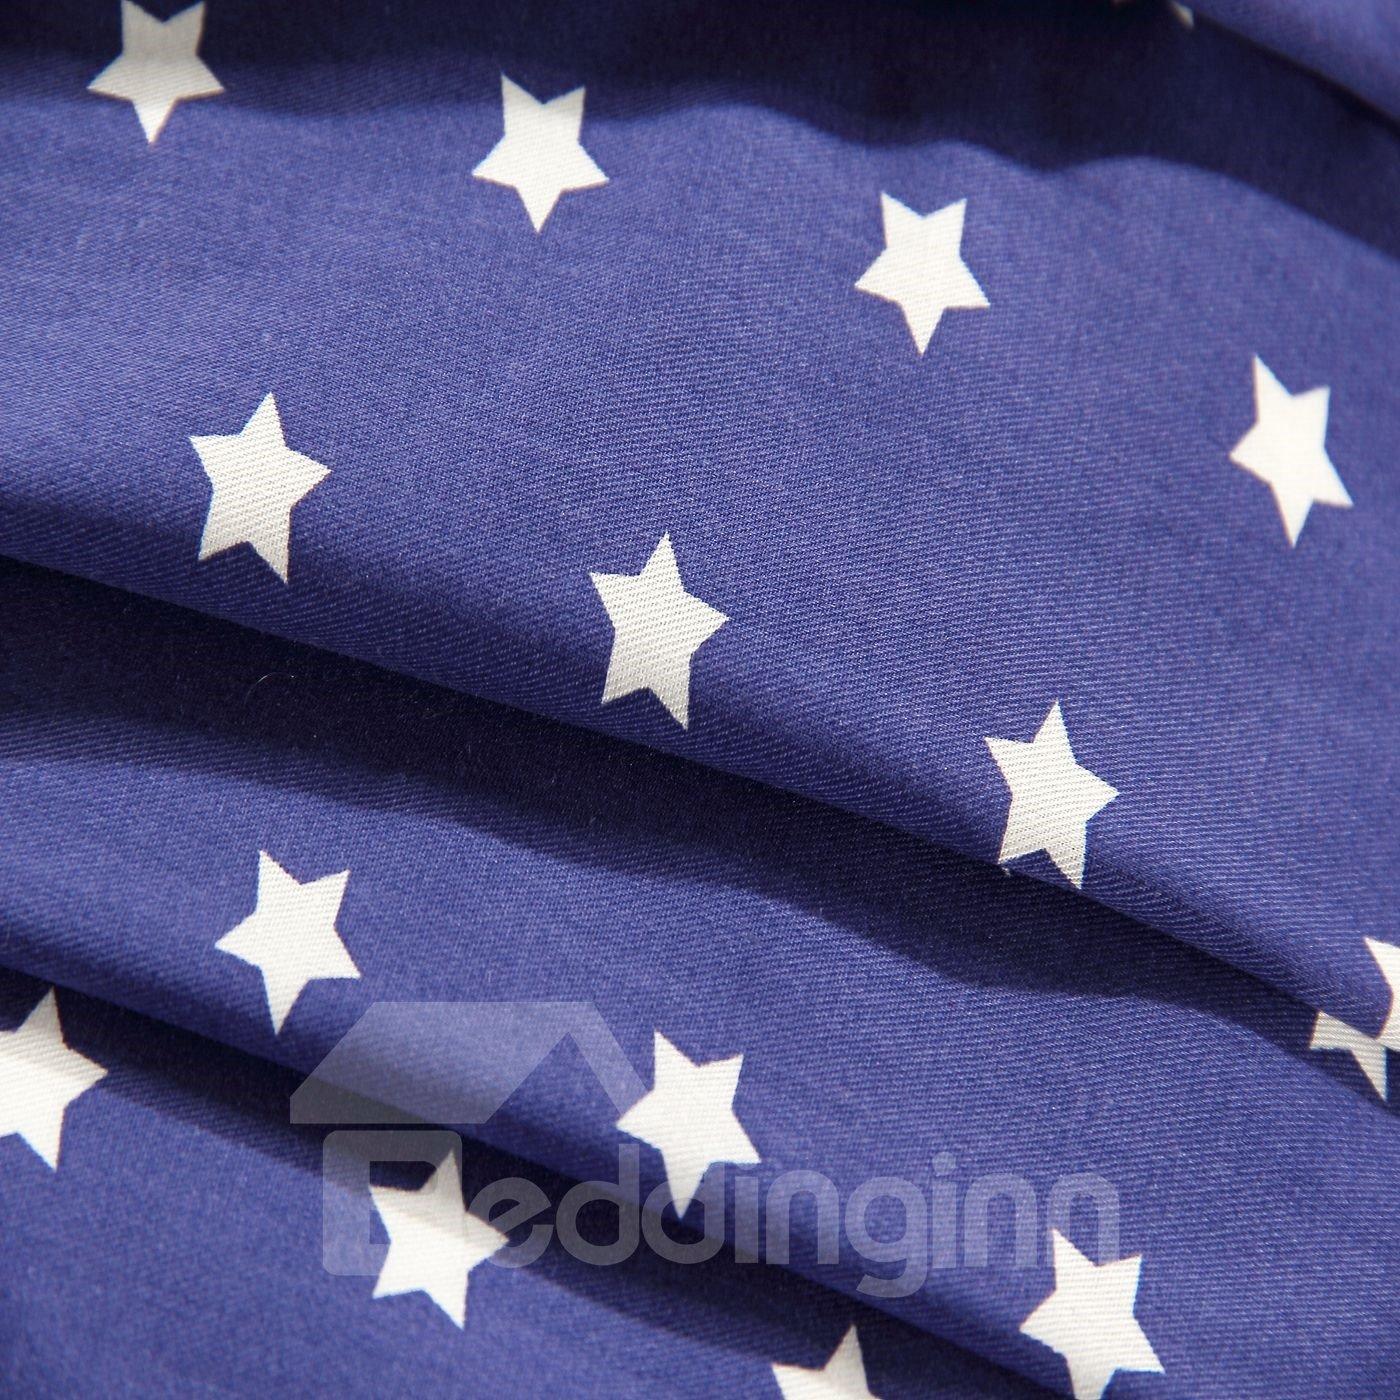 Little White Dots Printing 4-Piece Cotton Sheet Set